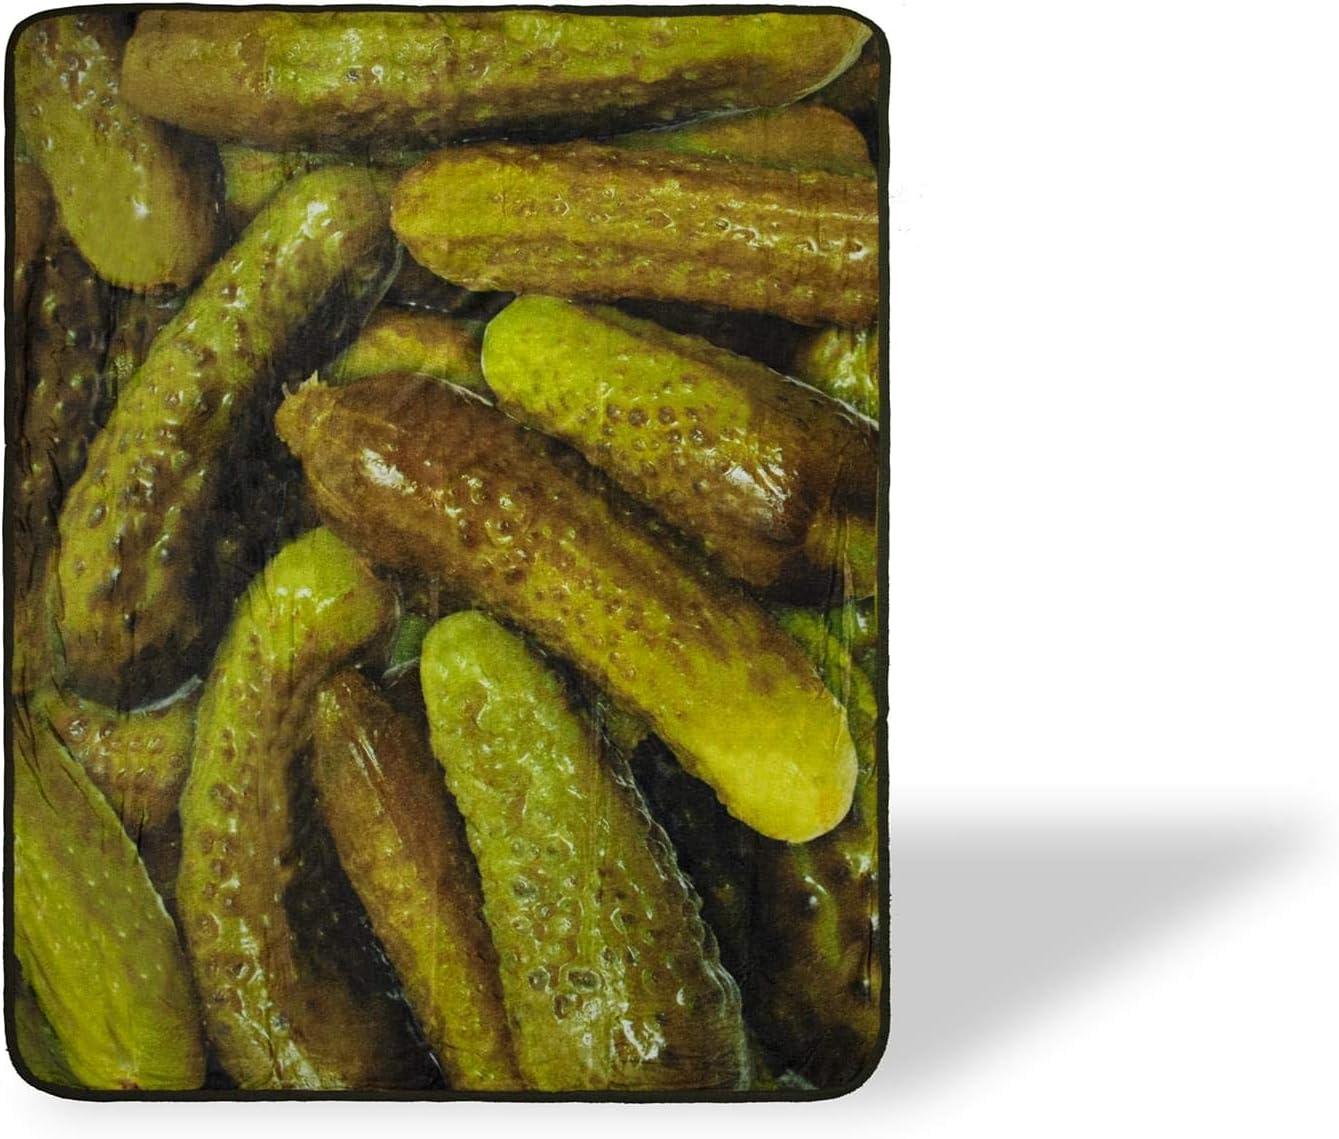 Pickles Fleece Throw Blanket | Large Soft Fleece Pickle Blanket | Food Blanket Soft Blankets And Throws | Officially Licensed Pickle Throw Blankets | Measures 60 x 45 Inches